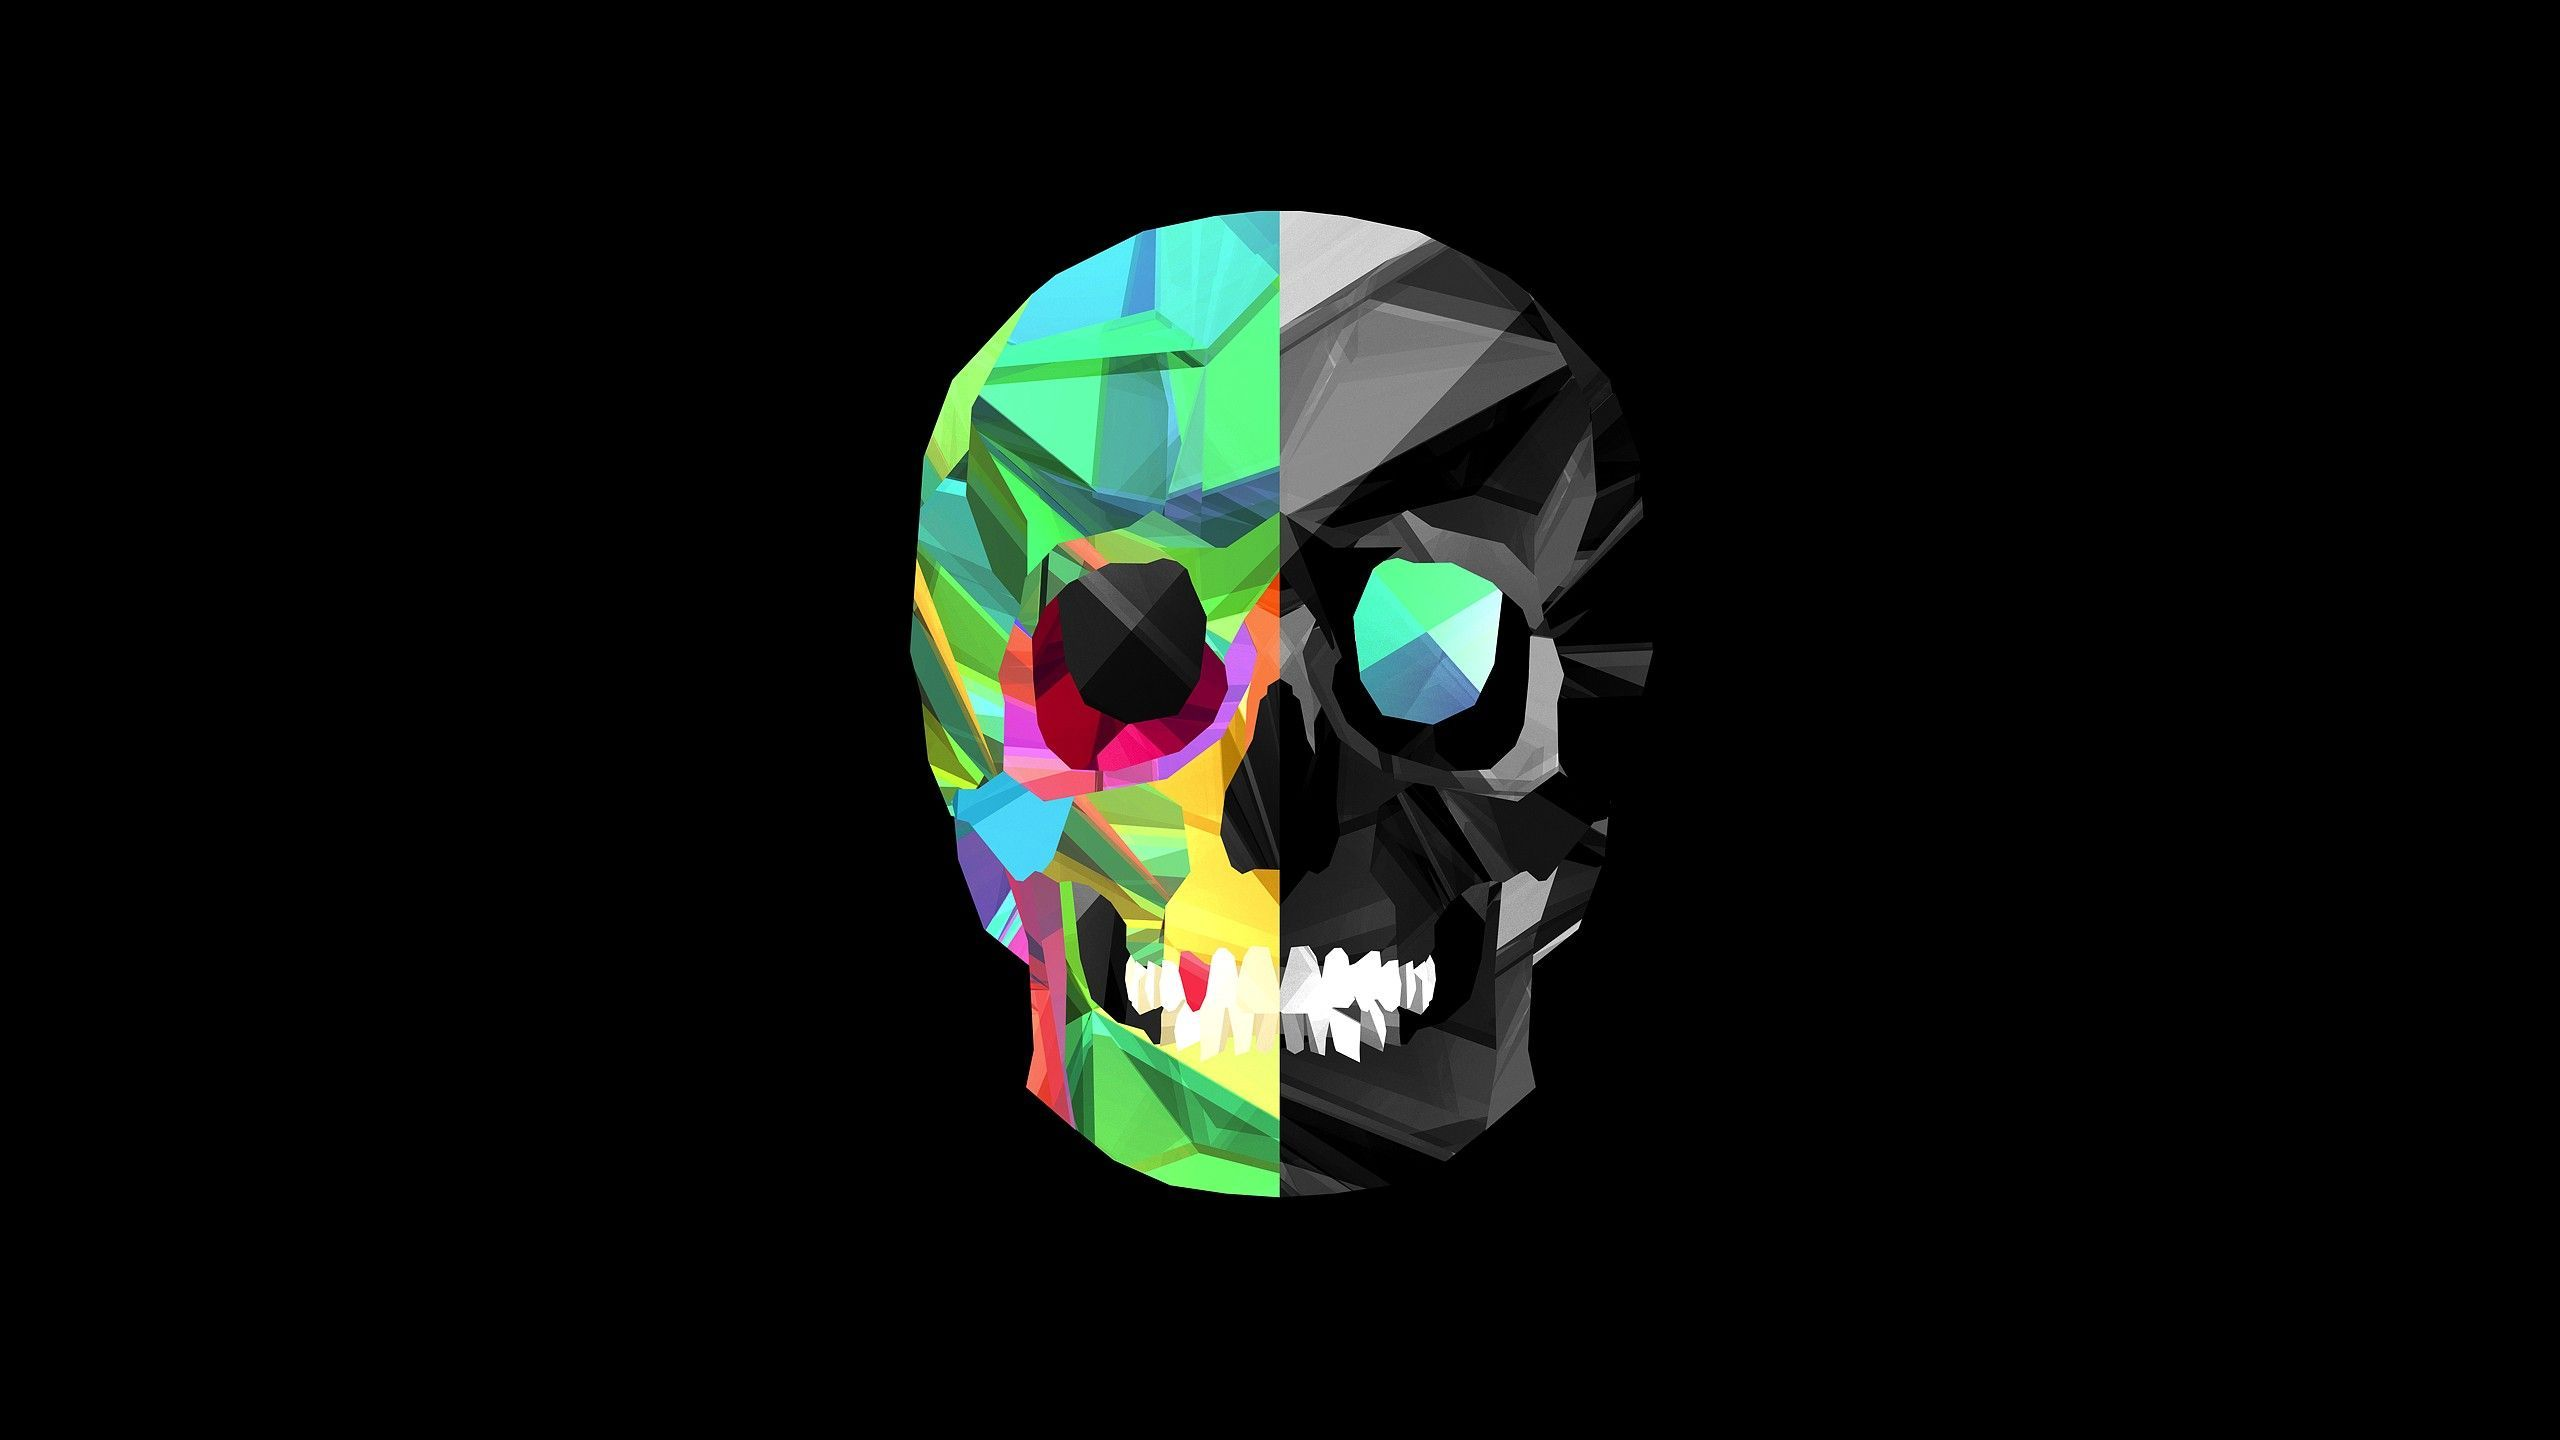 e40094200ae Digital Art Skull Wallpaper